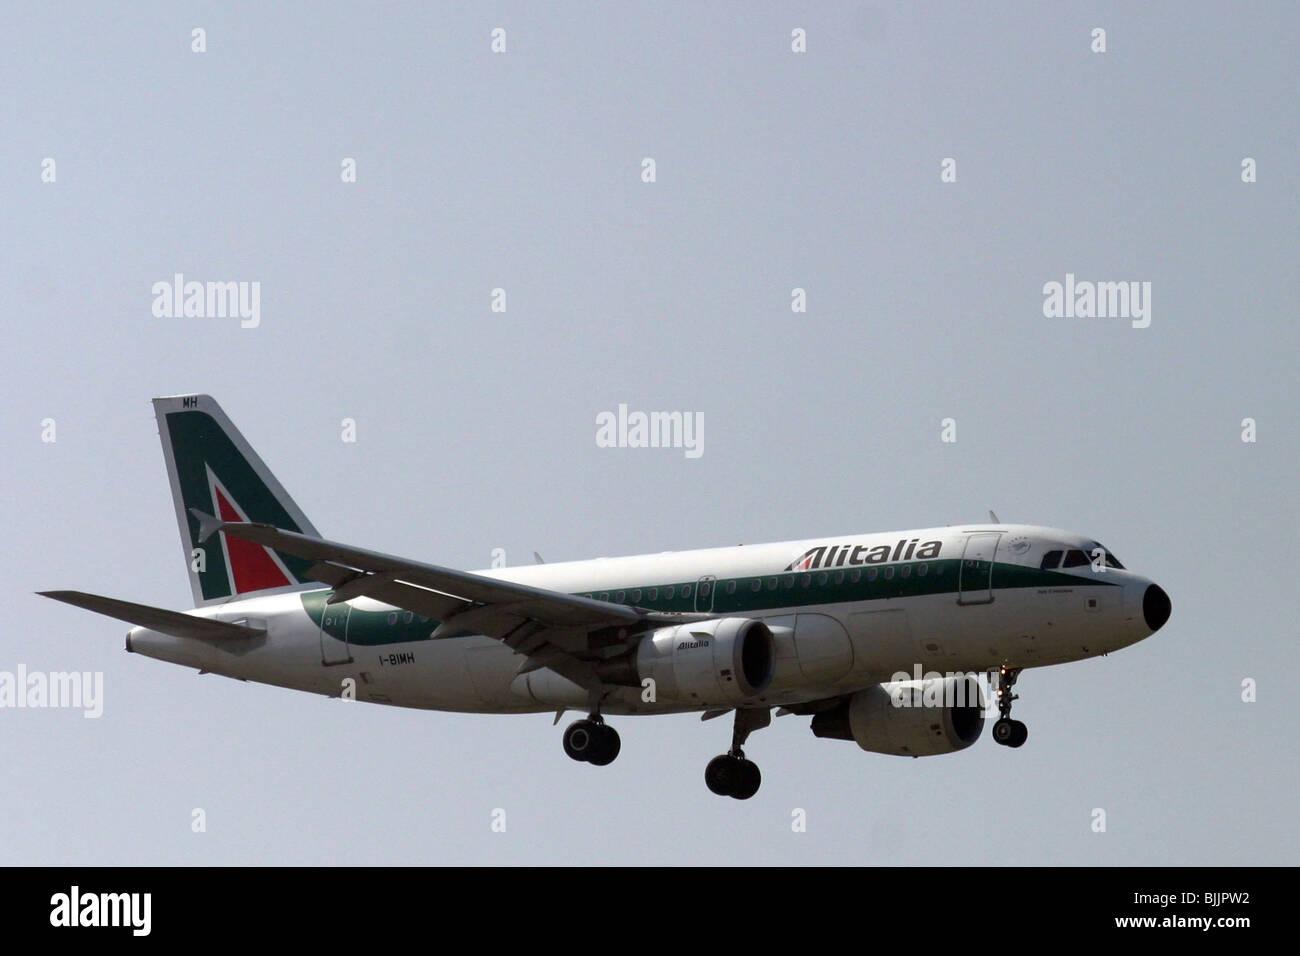 Italy, Milan, Linate Airport, Alitalia passenger jet at landing - Stock Image